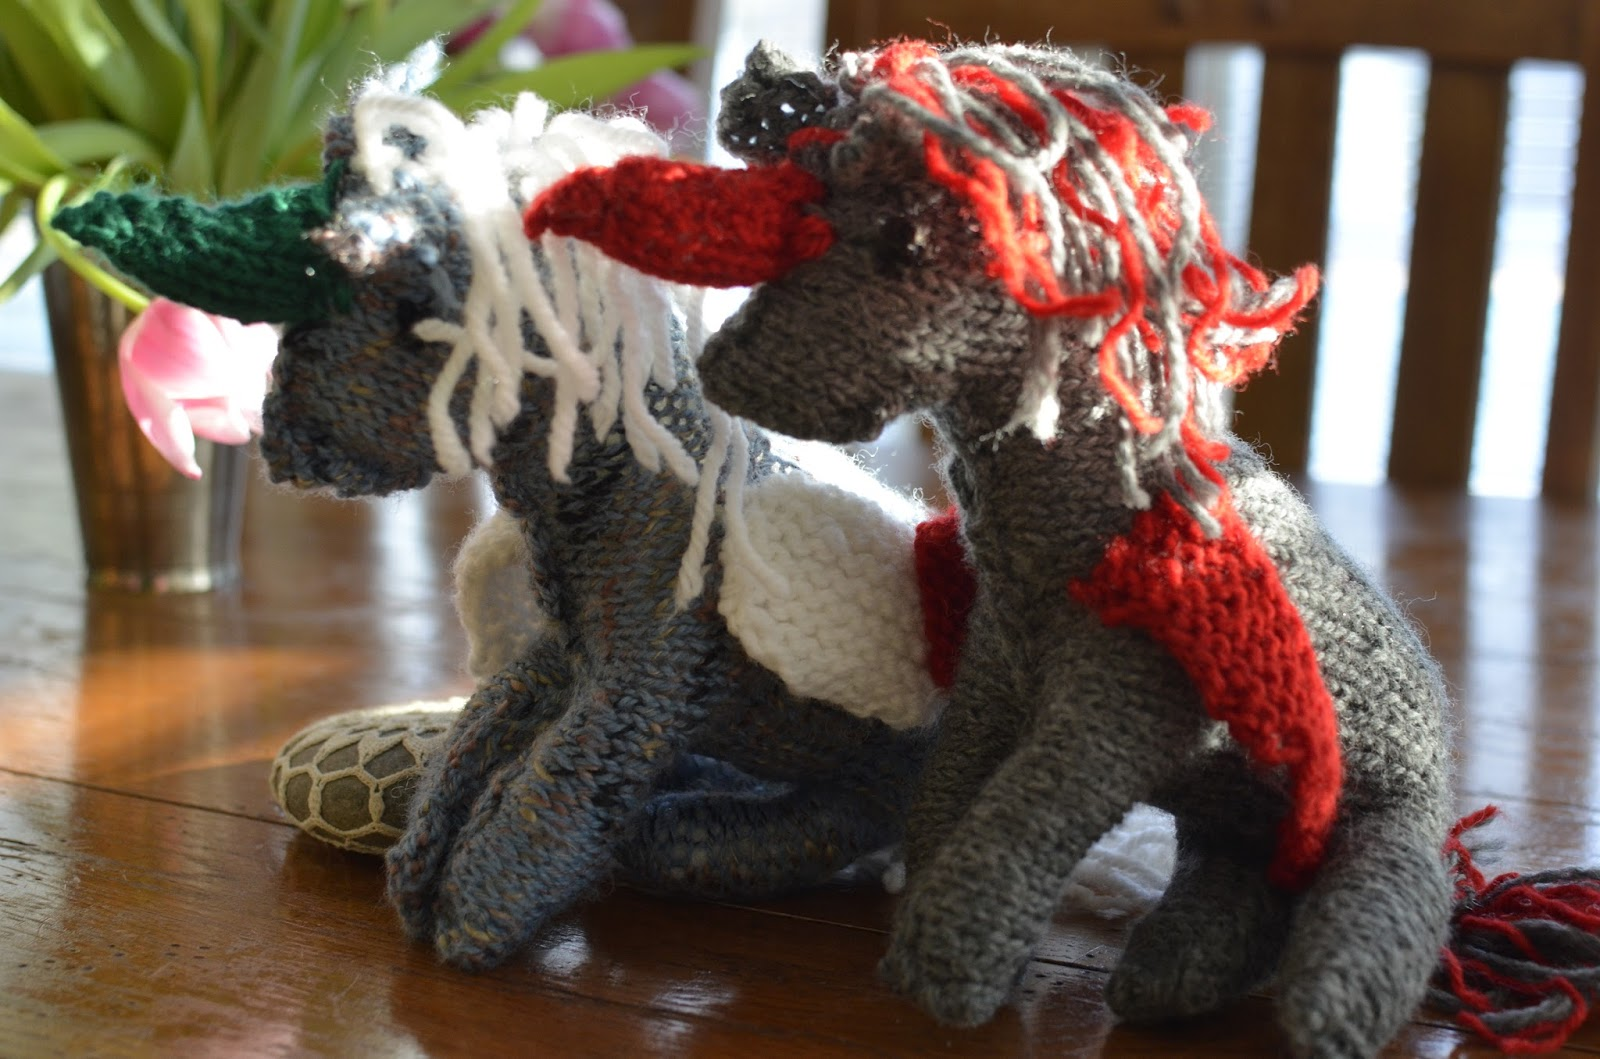 Unicorn Knitting Books : Charming the birds from trees sugar plum s knitting